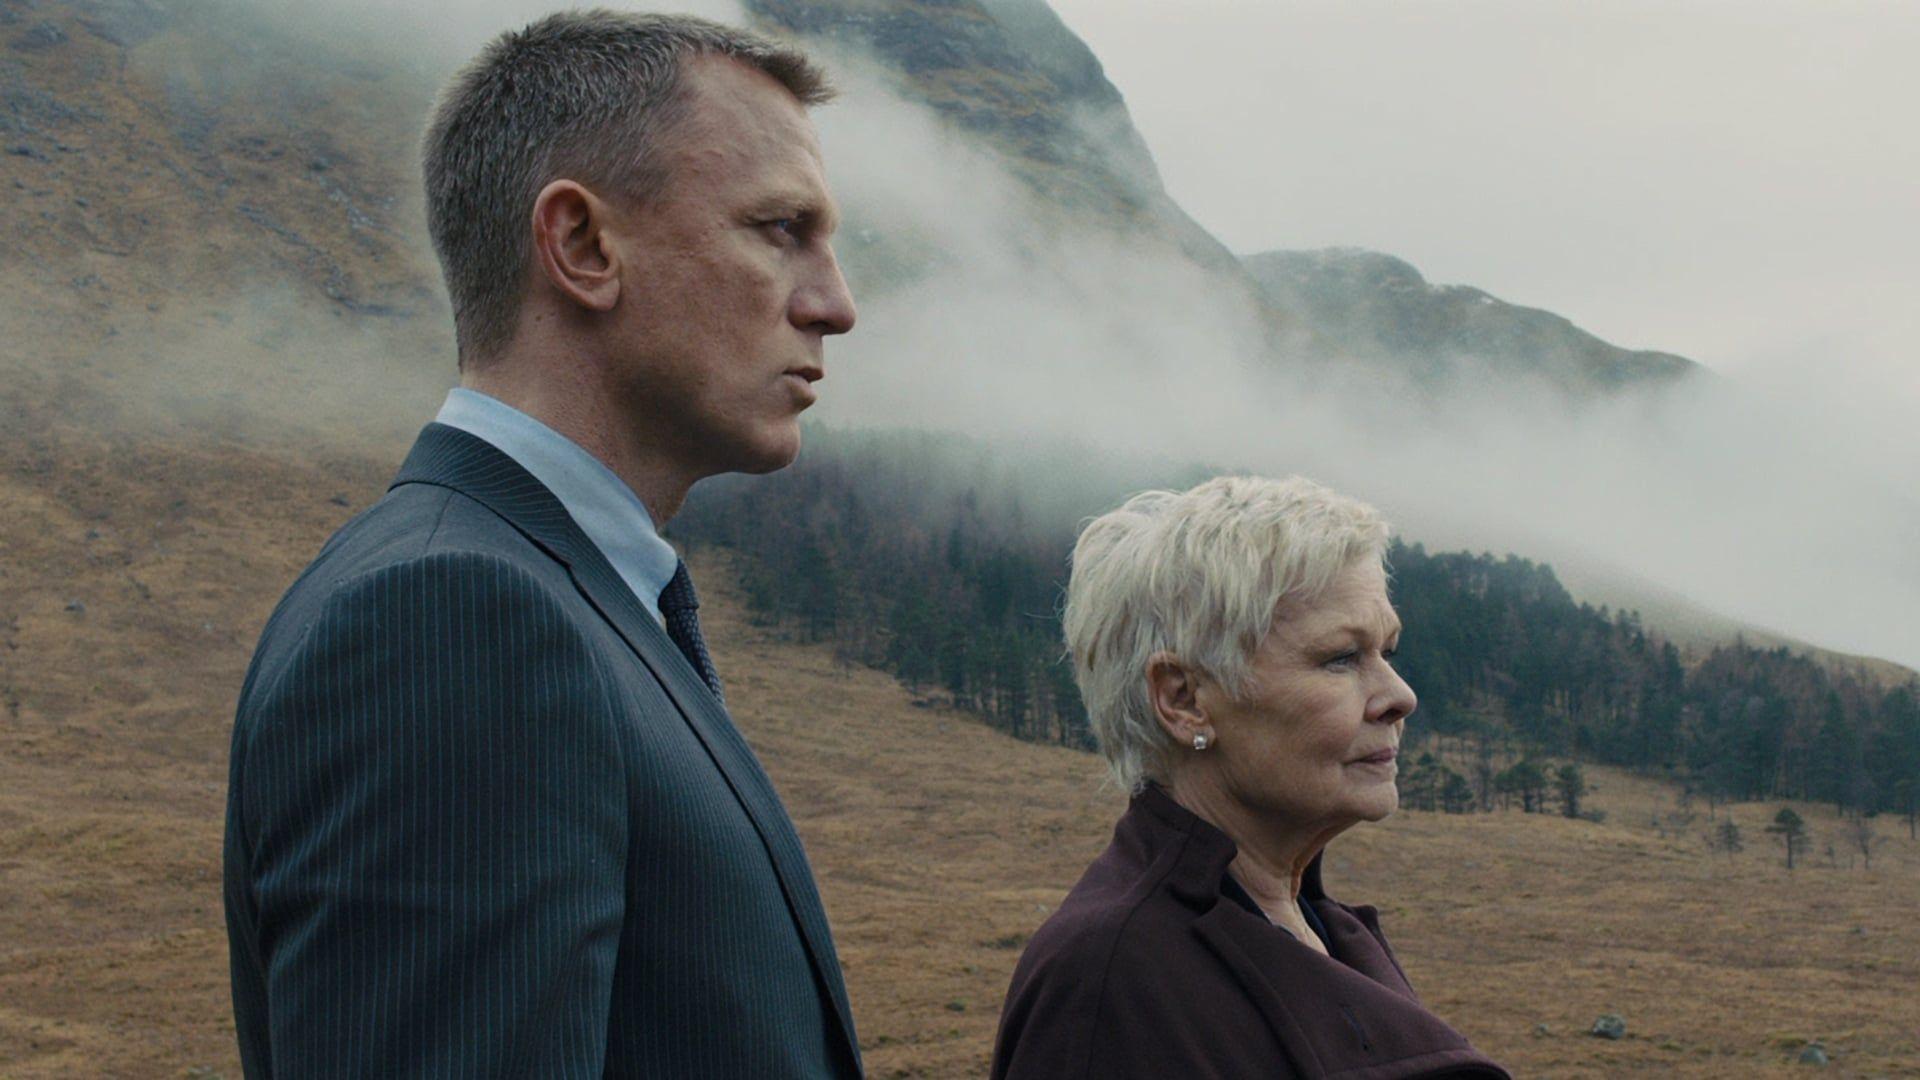 007 Skyfall 2012 Online Teljes Film Filmek Magyarul Letoltes Hd A 007 Es Immar 23 Alkalommal Vallalkozik A Lehetetlenre Ho Skyfall Movies Old Movie Posters